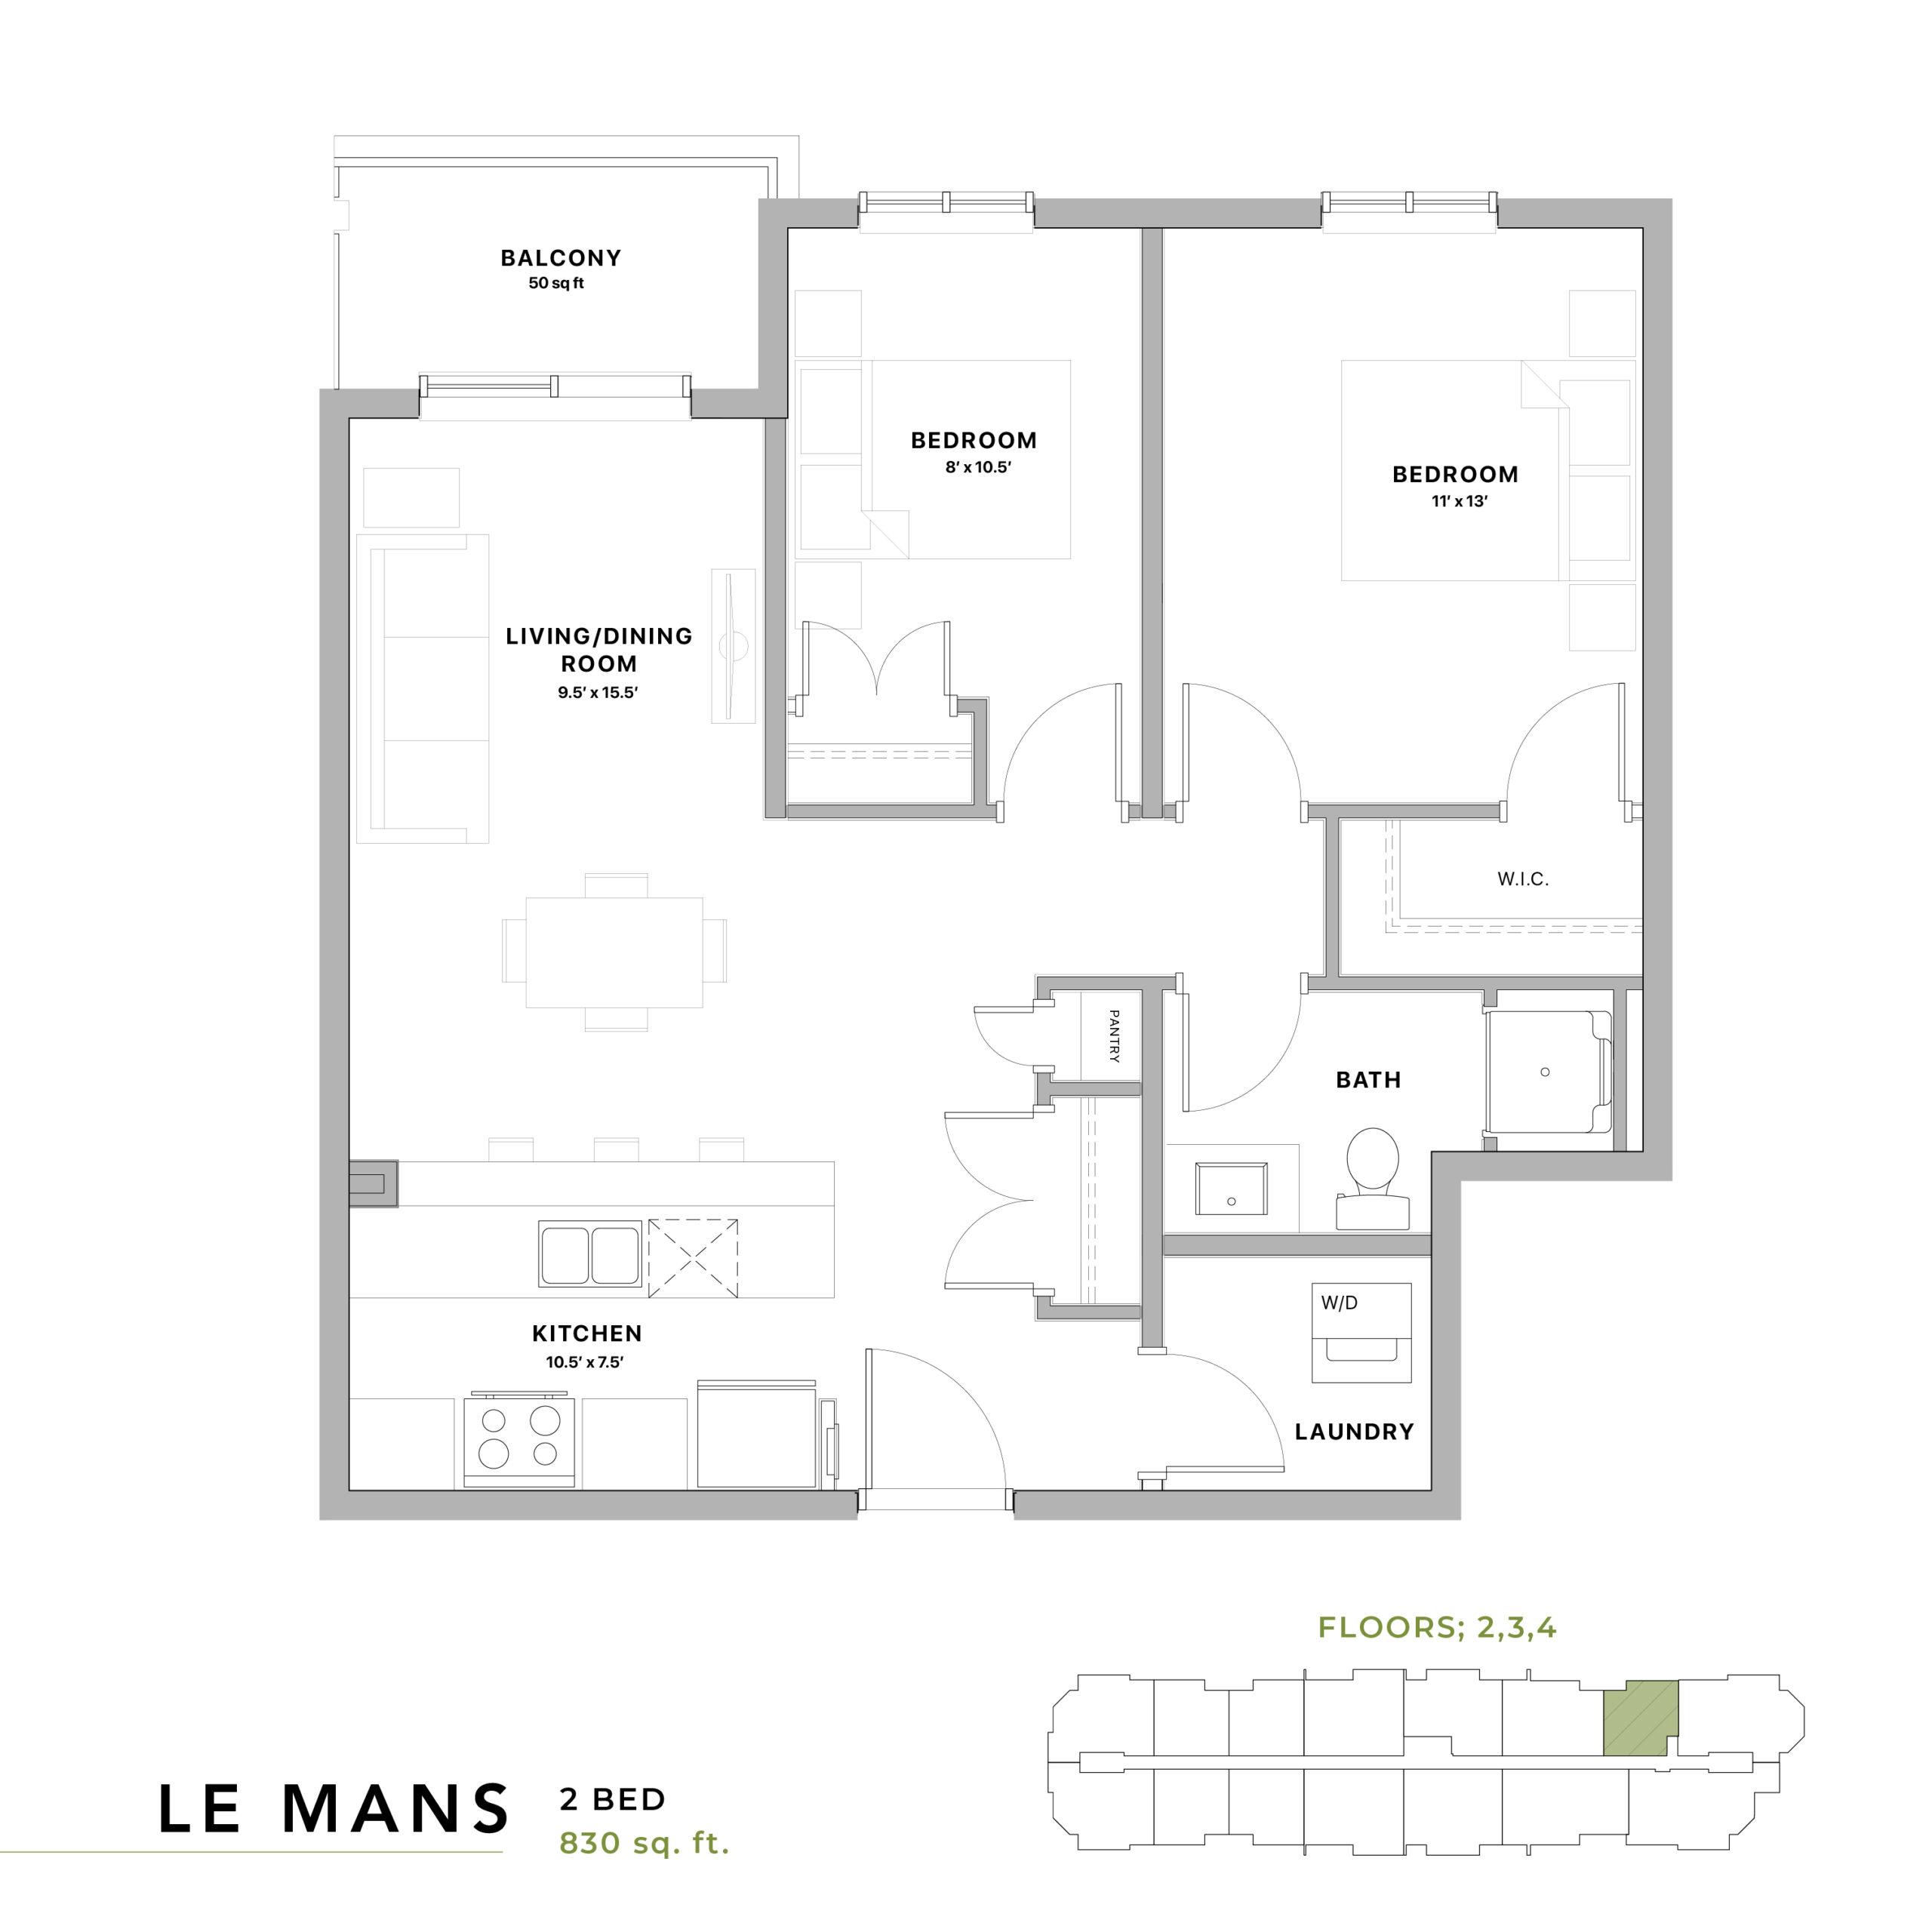 Le Mans Floorplan